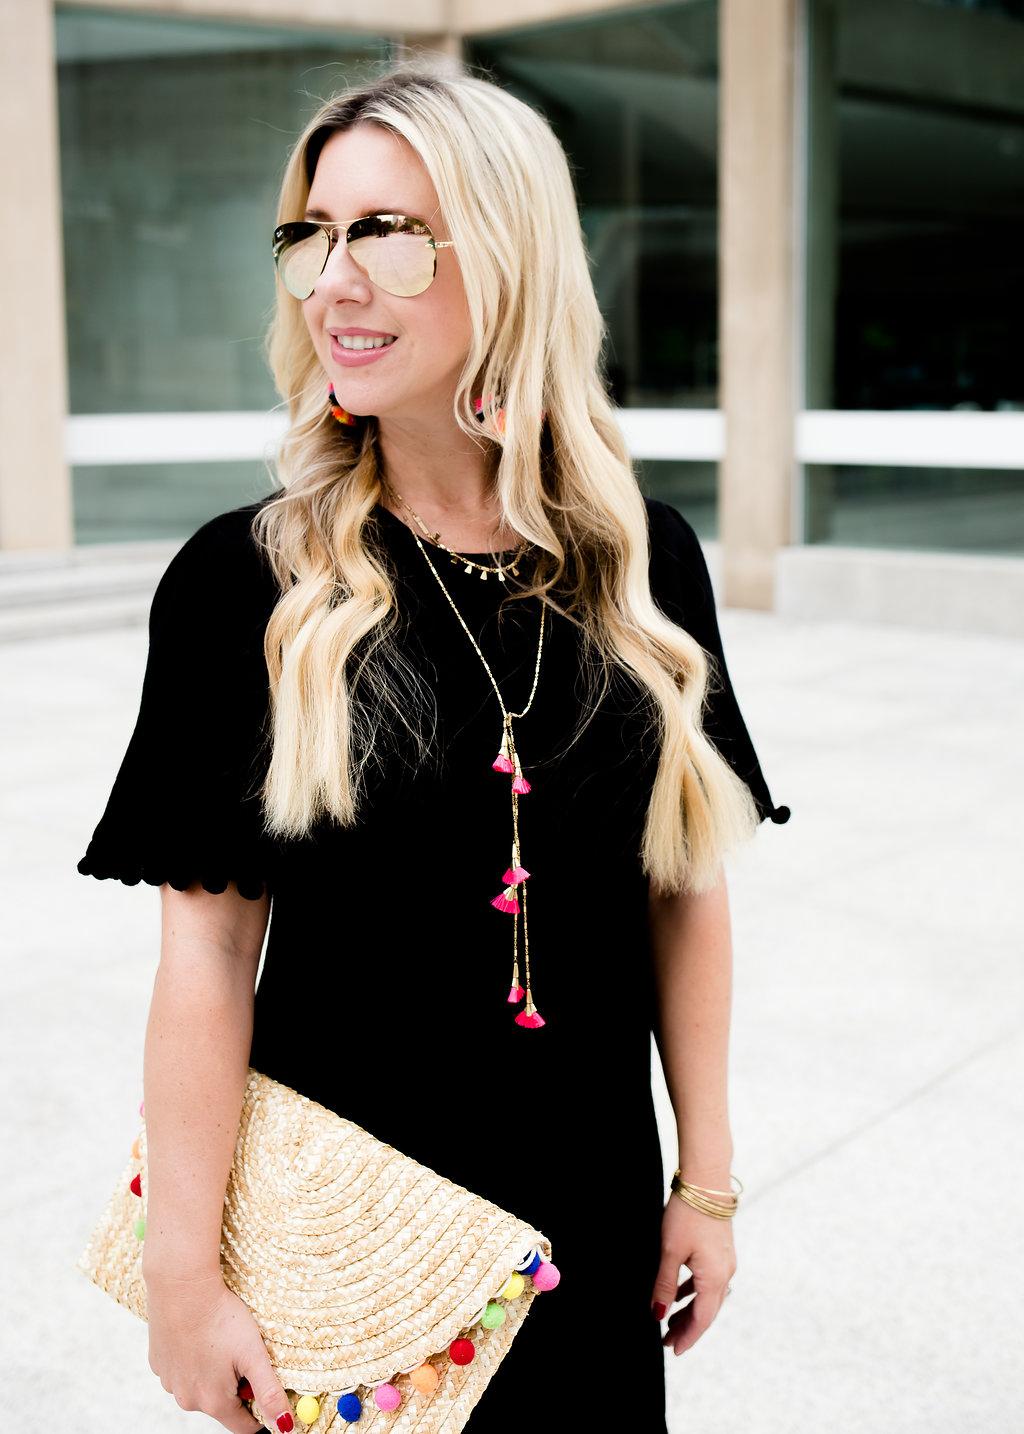 Pom Pom Shift Dress | The Darling Petite Diva | Nicole Kirk